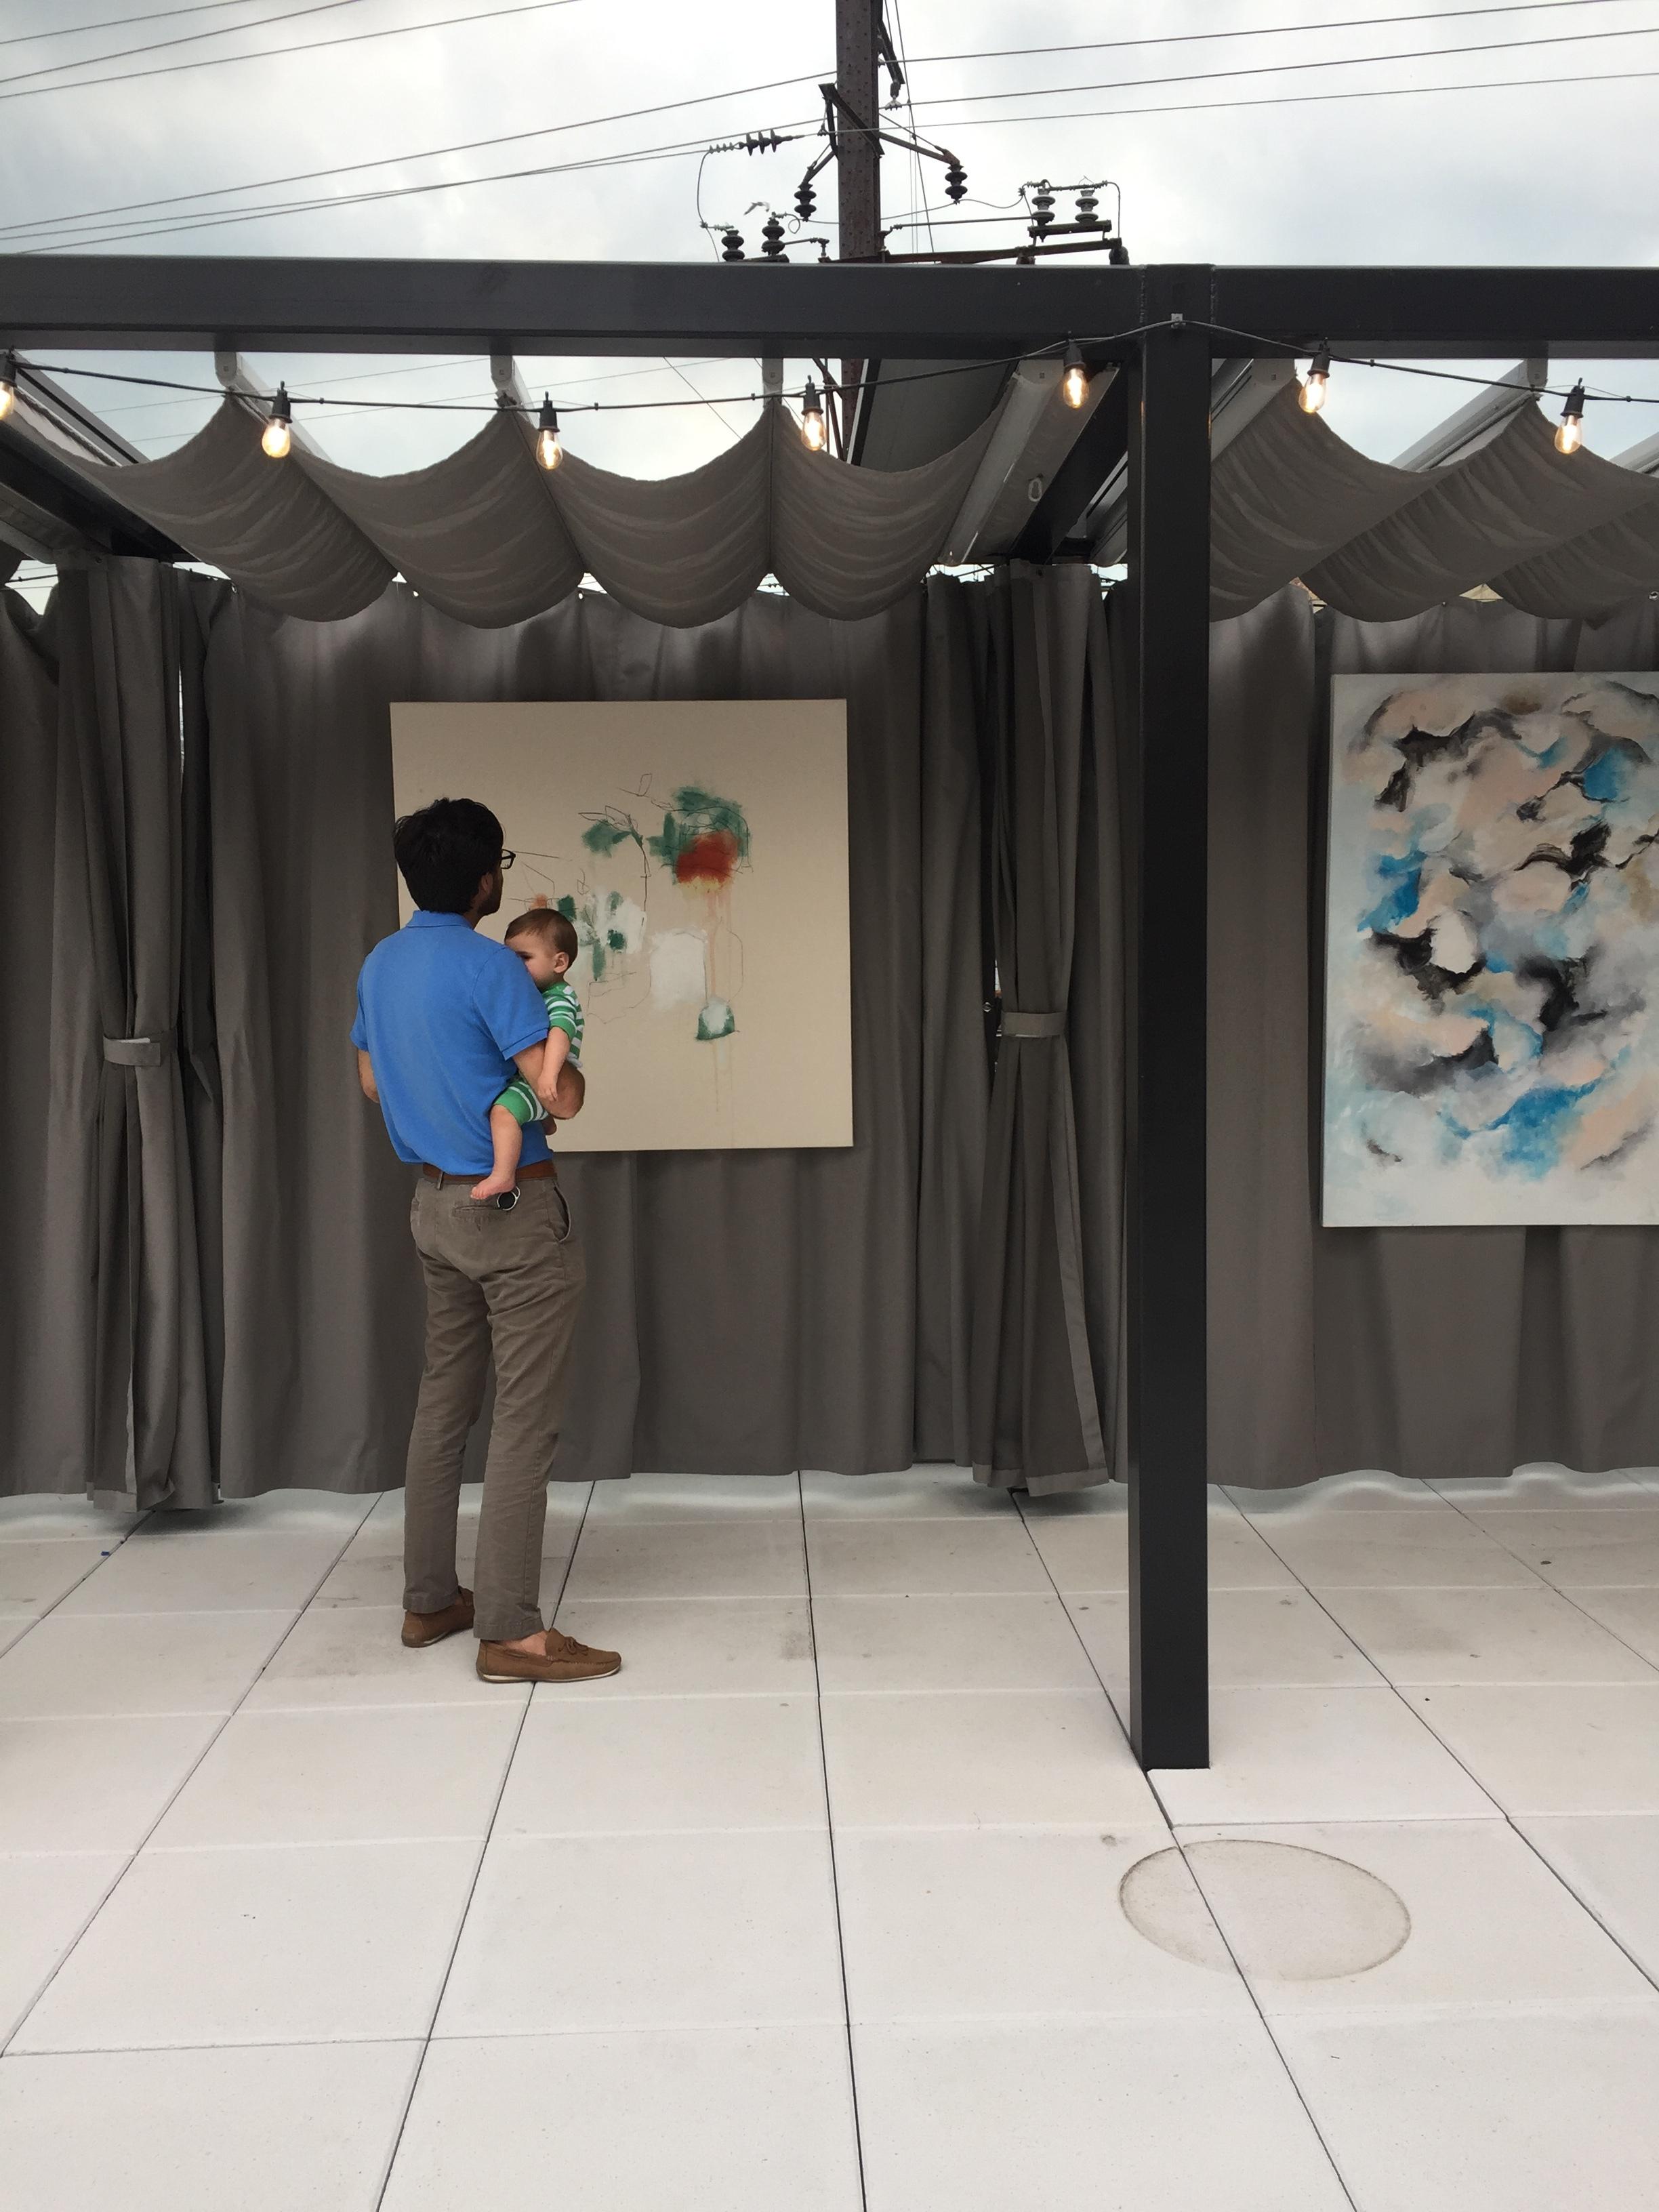 Latela-Spoke-Commercial-Event-Art-Installation-Exhibition-Washington-DC